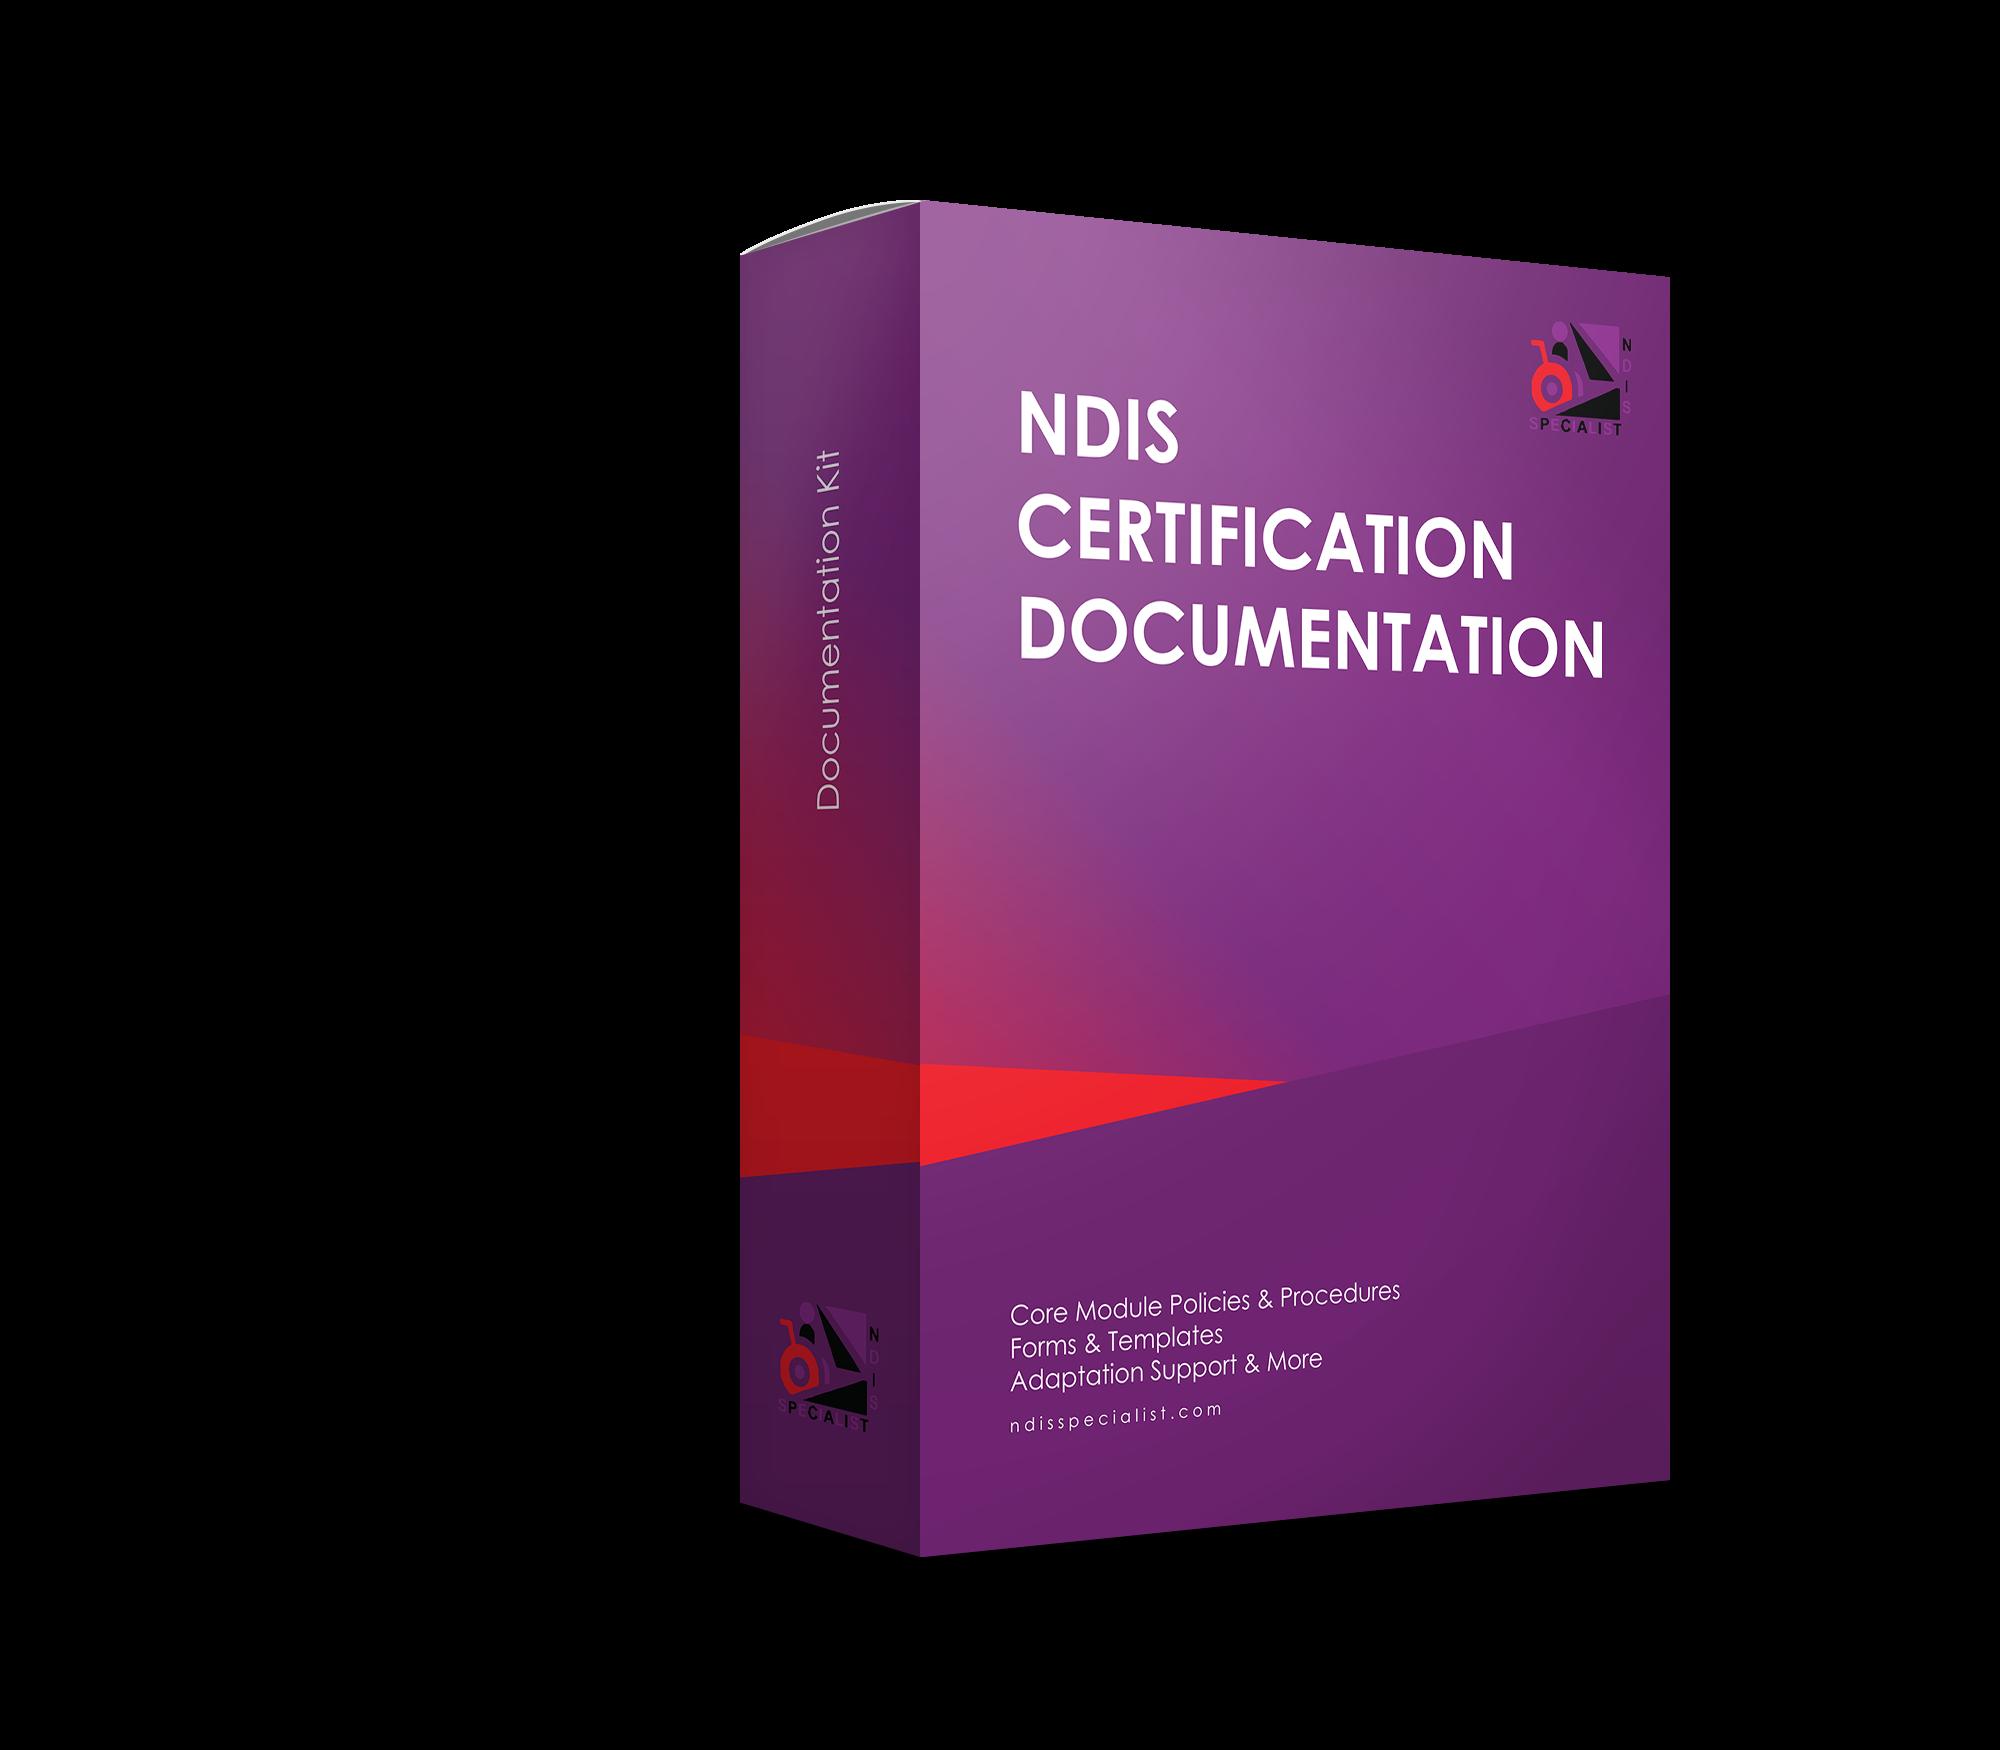 NDIS Certification Documentation